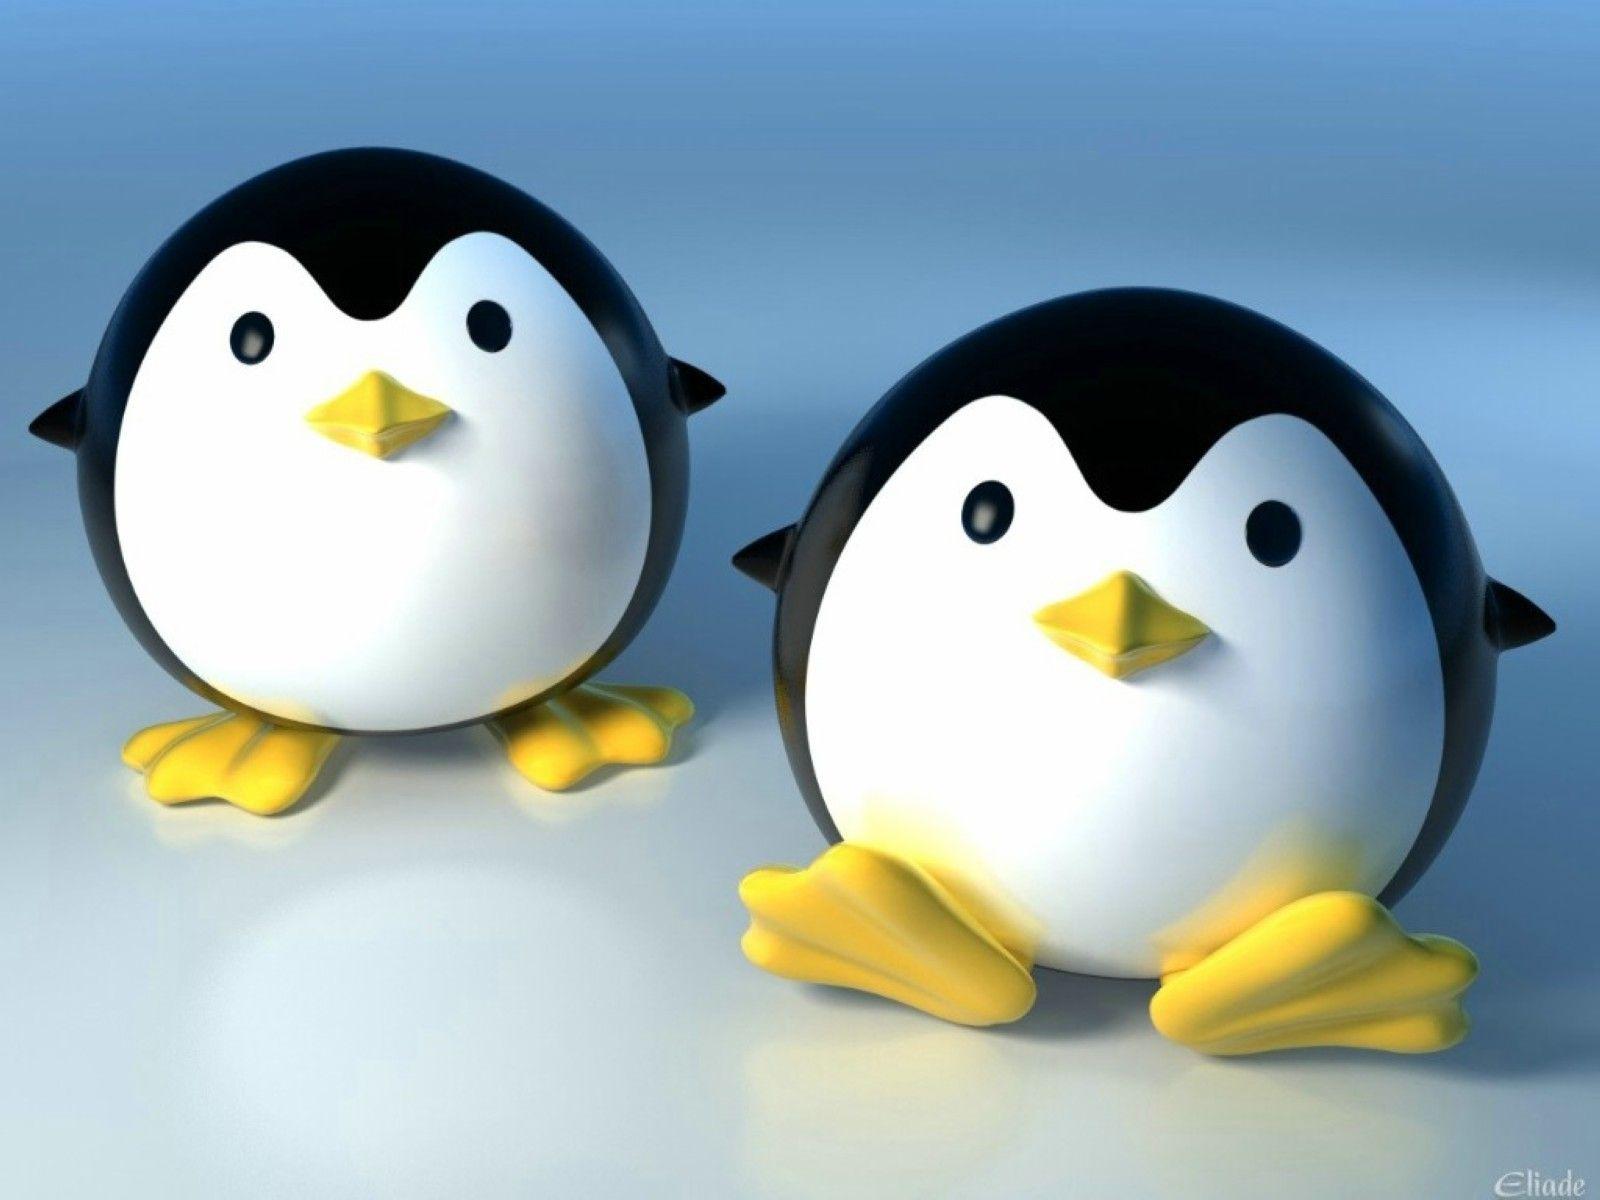 35 Cute Halloween Penguin Wallpapers   Download at WallpaperBro 1600x1200